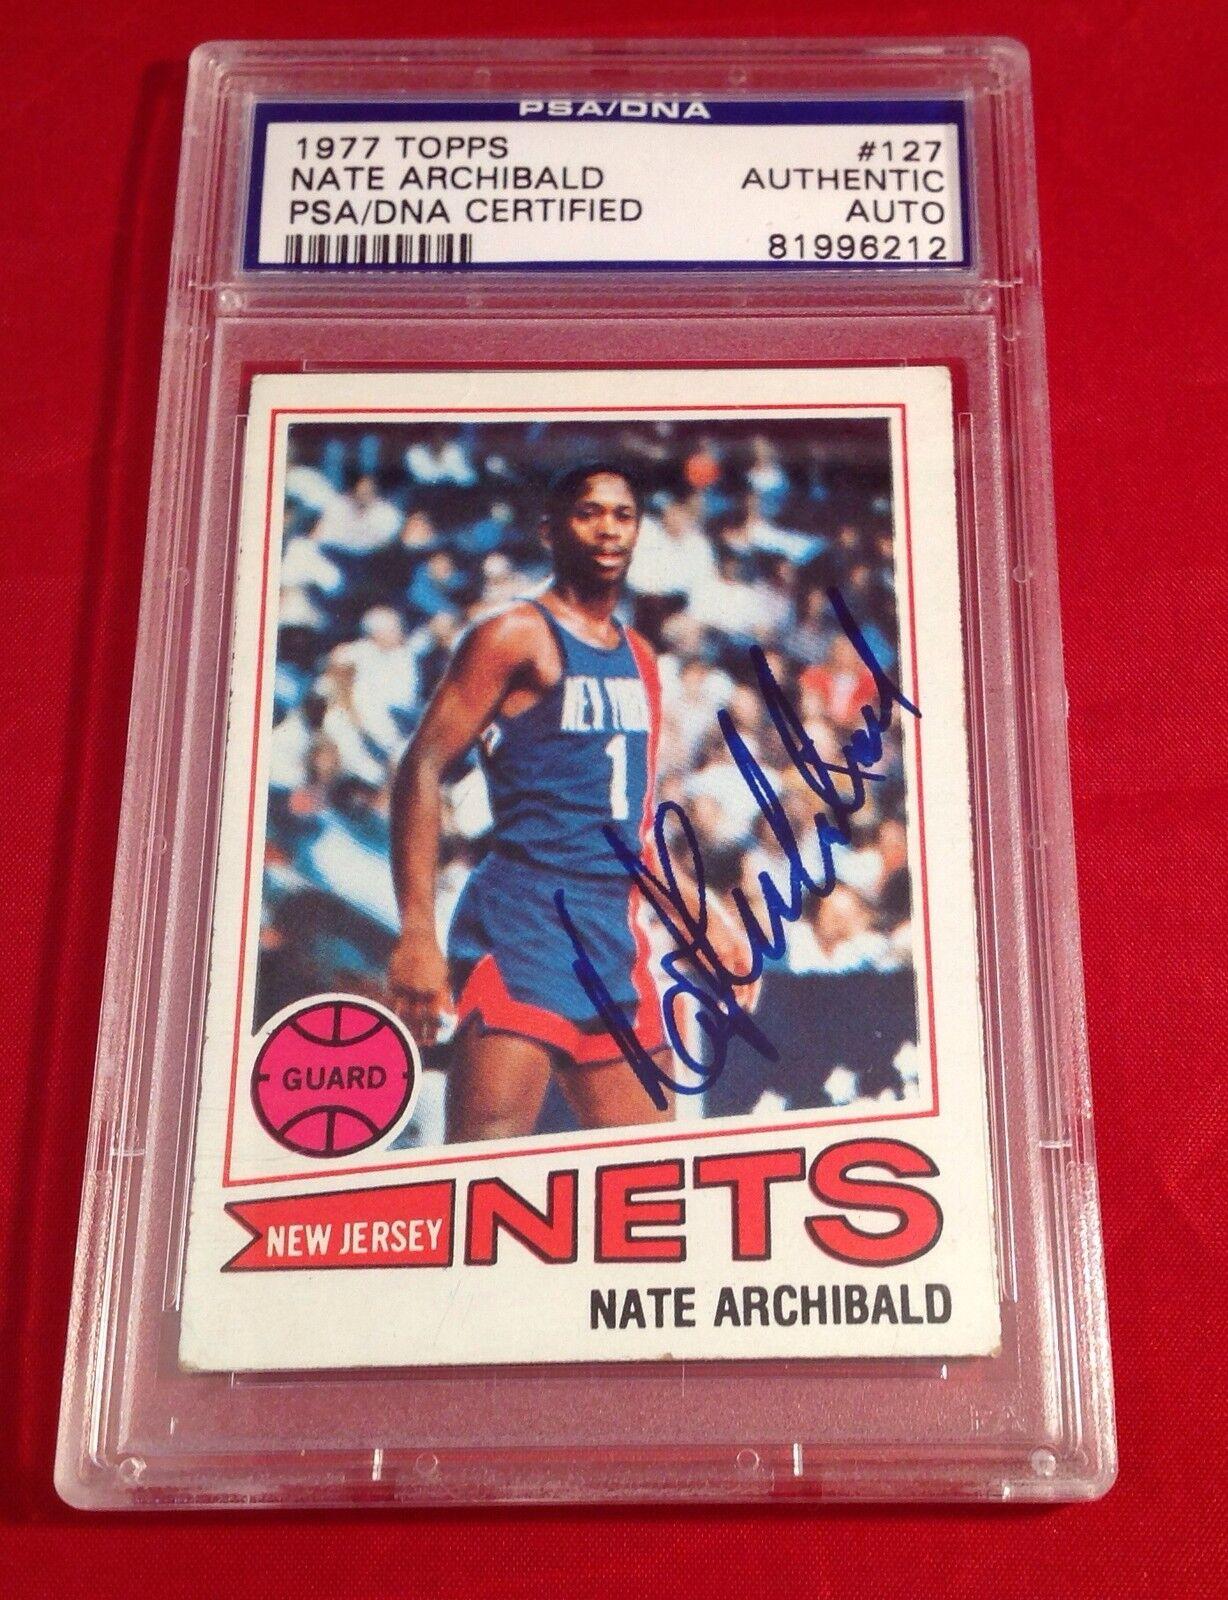 Nate Archibald 1977 Topps Card Slabbed PSA/DNA #81996212